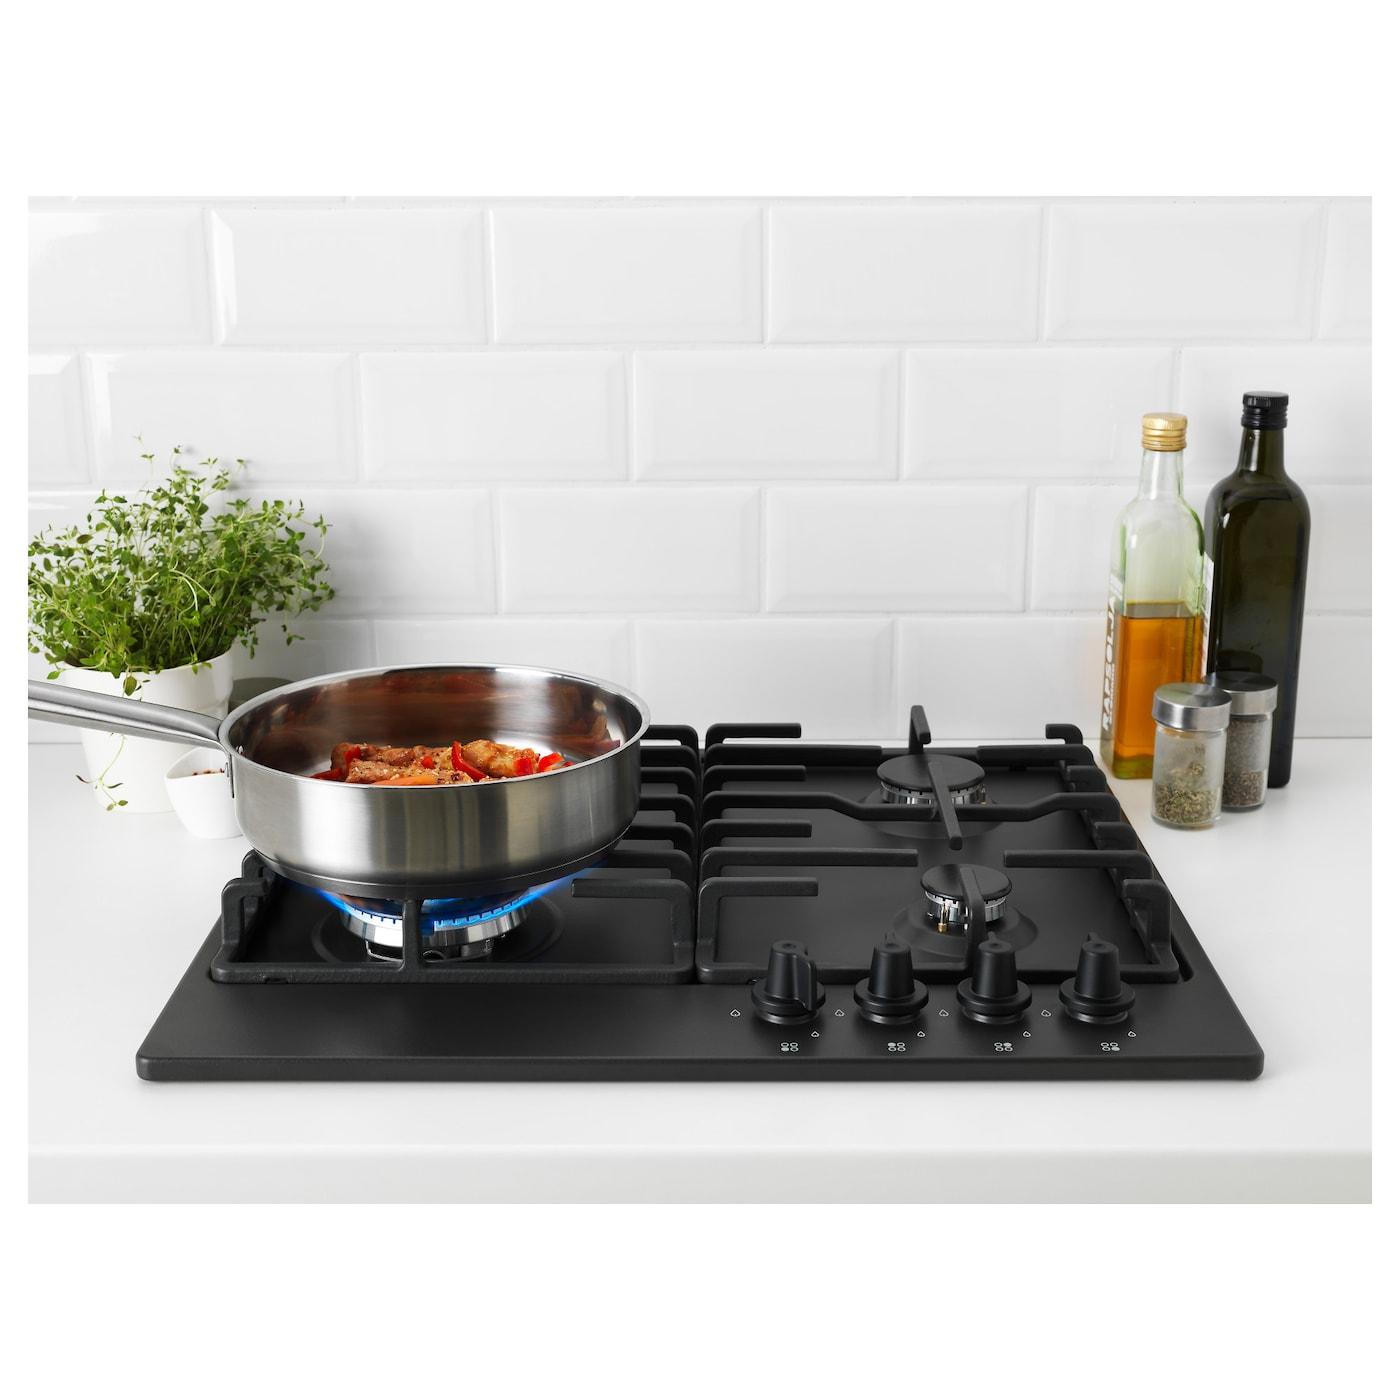 Kitchen Outlet Hob ~ LivslÅga gas hob dark grey ikea